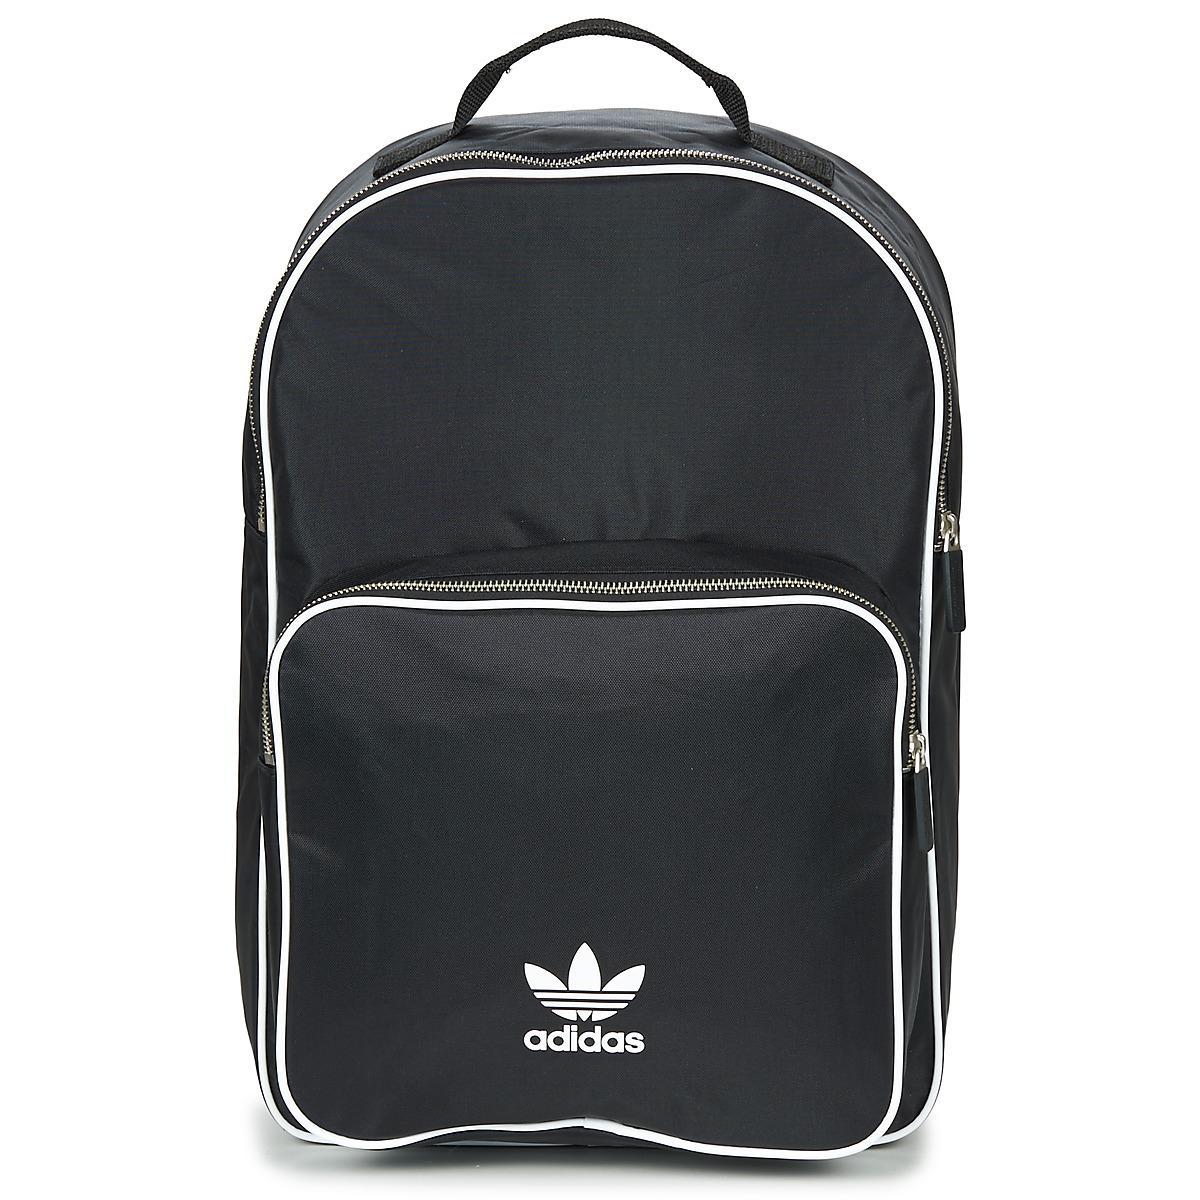 Adidas - Classic Adicolor Bp Women s Backpack In Black for Men - Lyst. View  fullscreen afffd47f70f32